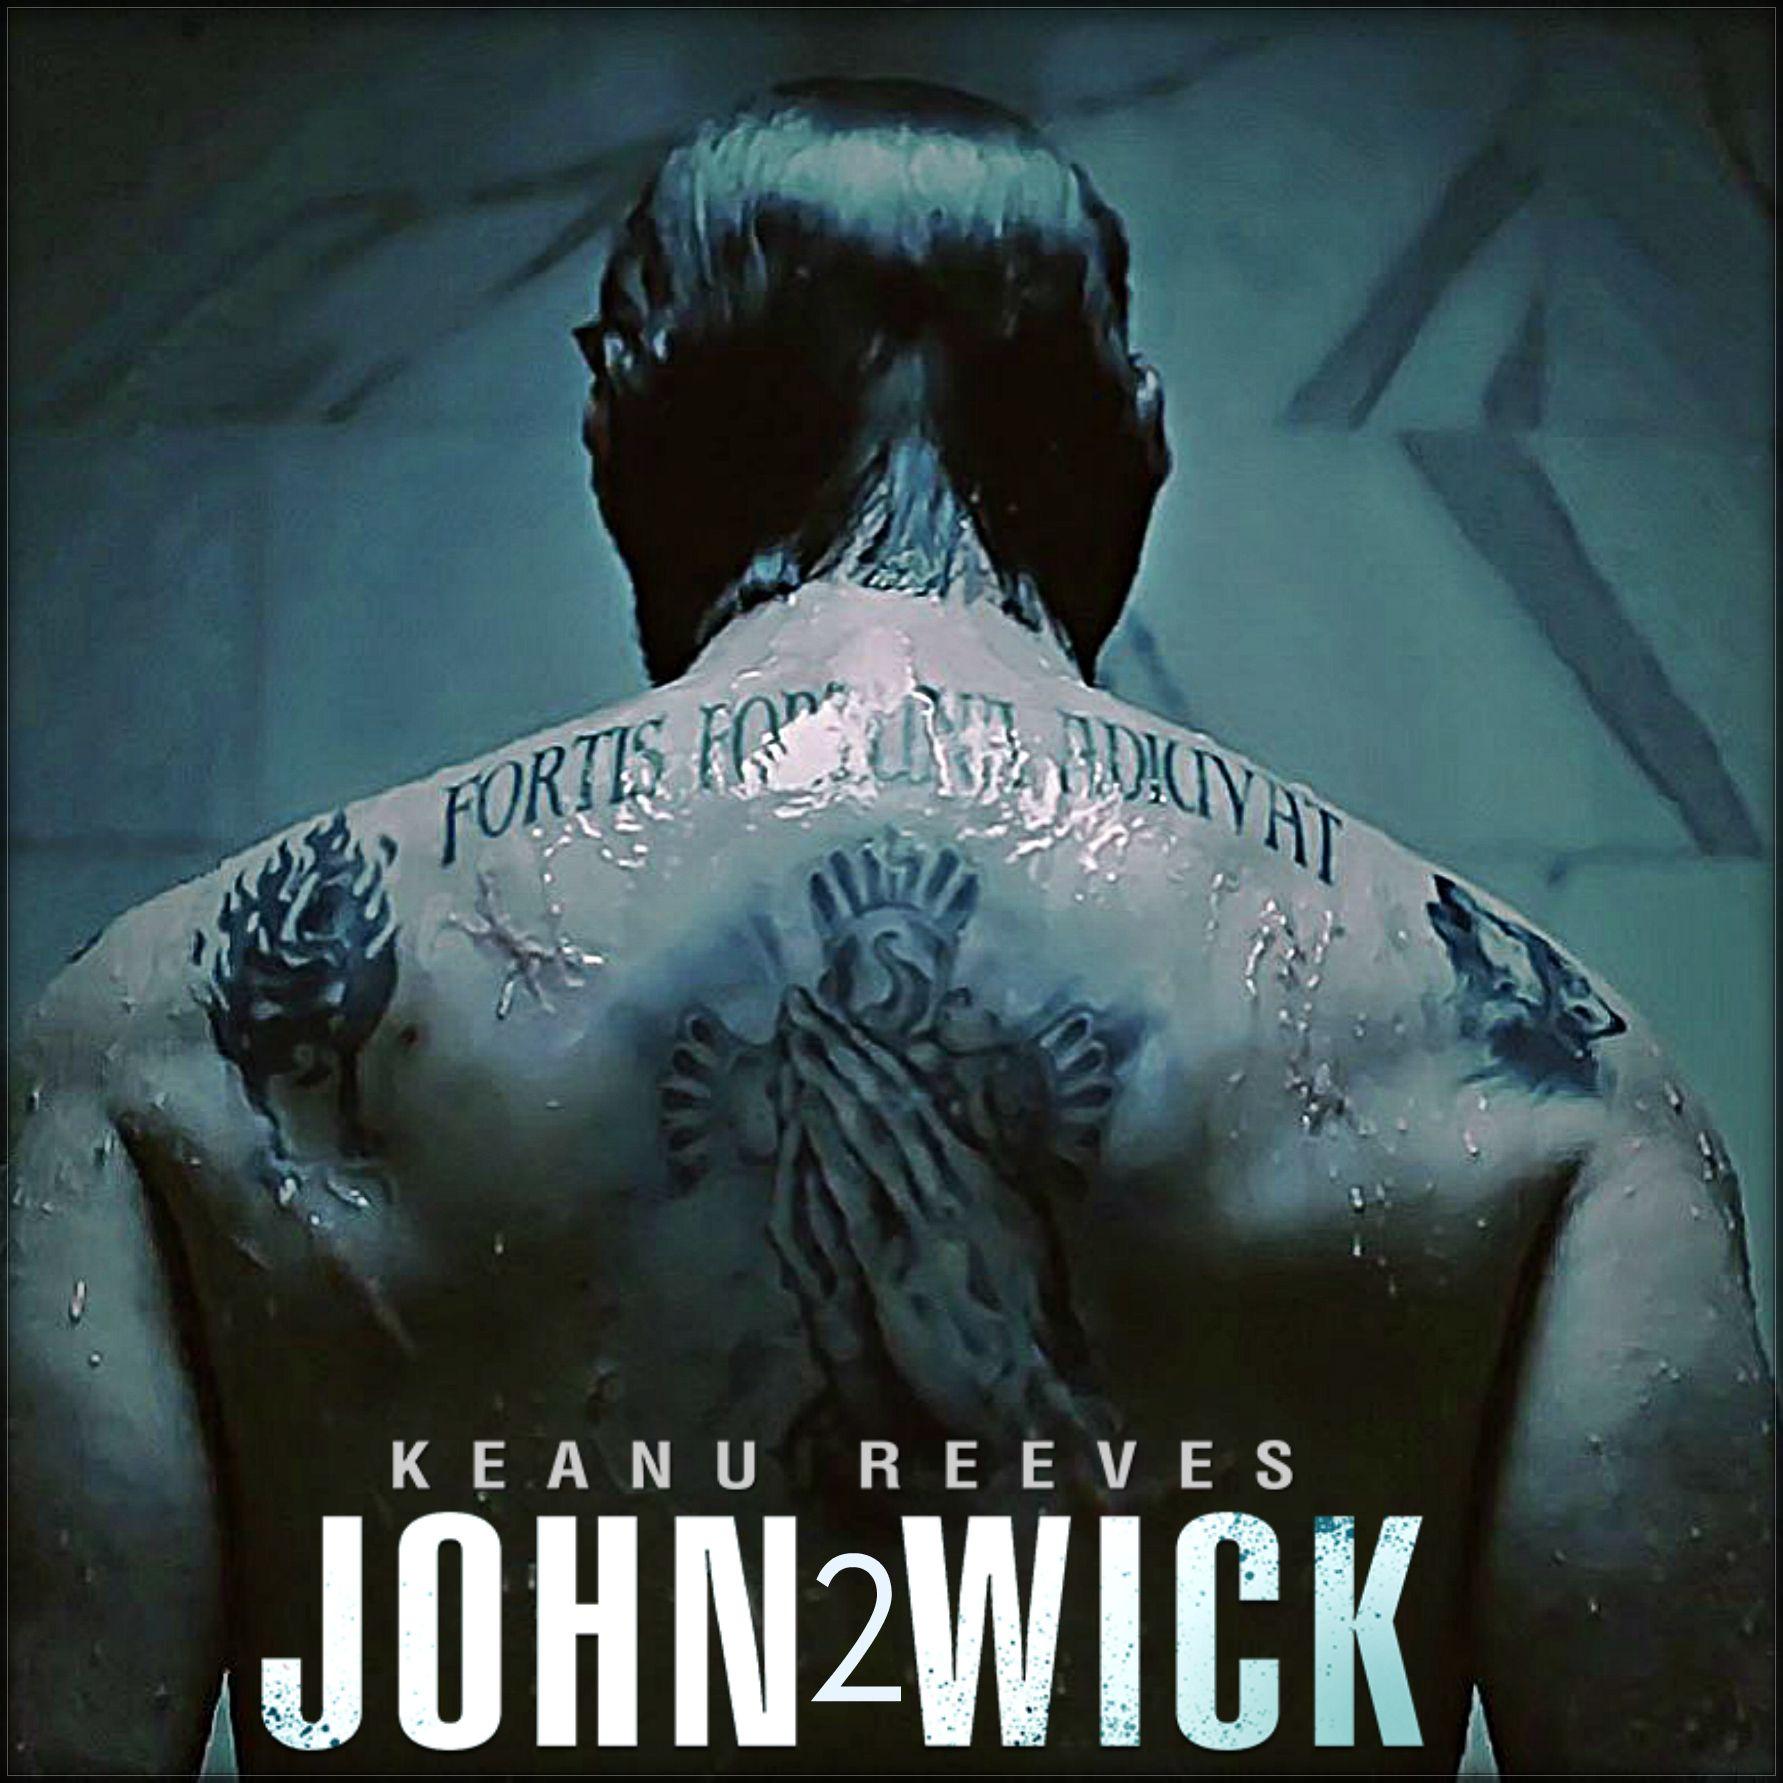 Tatuajes De John Wick: Happy Saturday And Waiting To Hear From John Wick 2